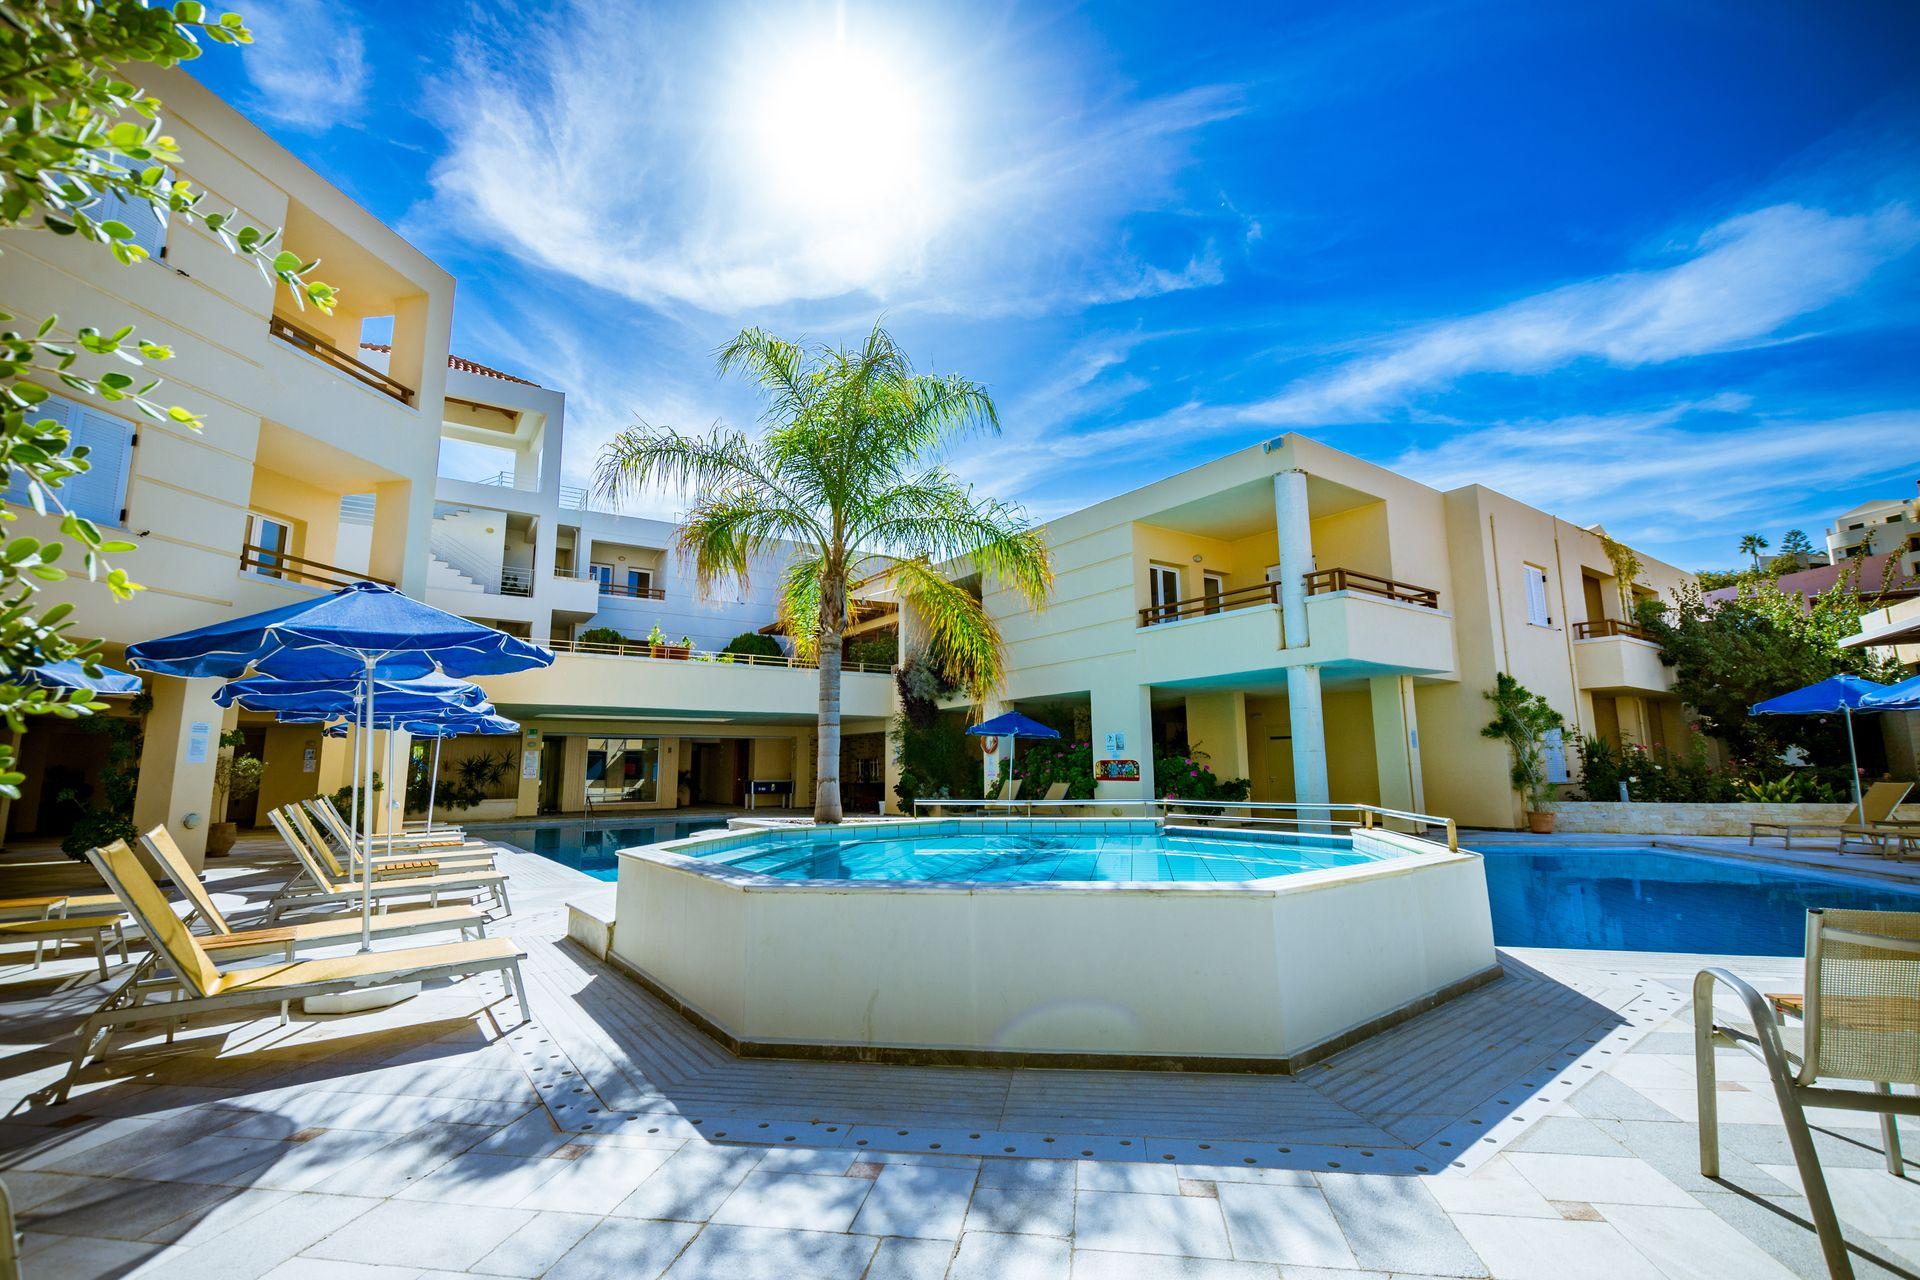 Anais Collection Hotels & Suites - Χανιά, Κρήτη ✦ 2 Ημέρες (1 Διανυκτέρευση) ✦ 2 άτομα ✦ Χωρίς Πρωινό ✦ 01/09/2021 έως 30/09/2021 ✦ <strong>Επιλέξτε 4 διανυκτερεύσεις και πληρώστε μόνο τις 3! </strong>